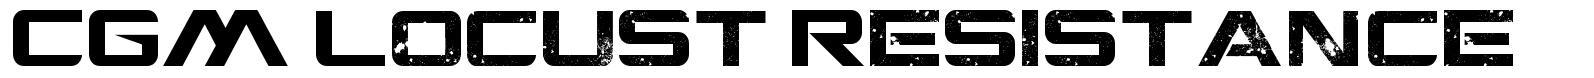 CGM Locust Resistance font